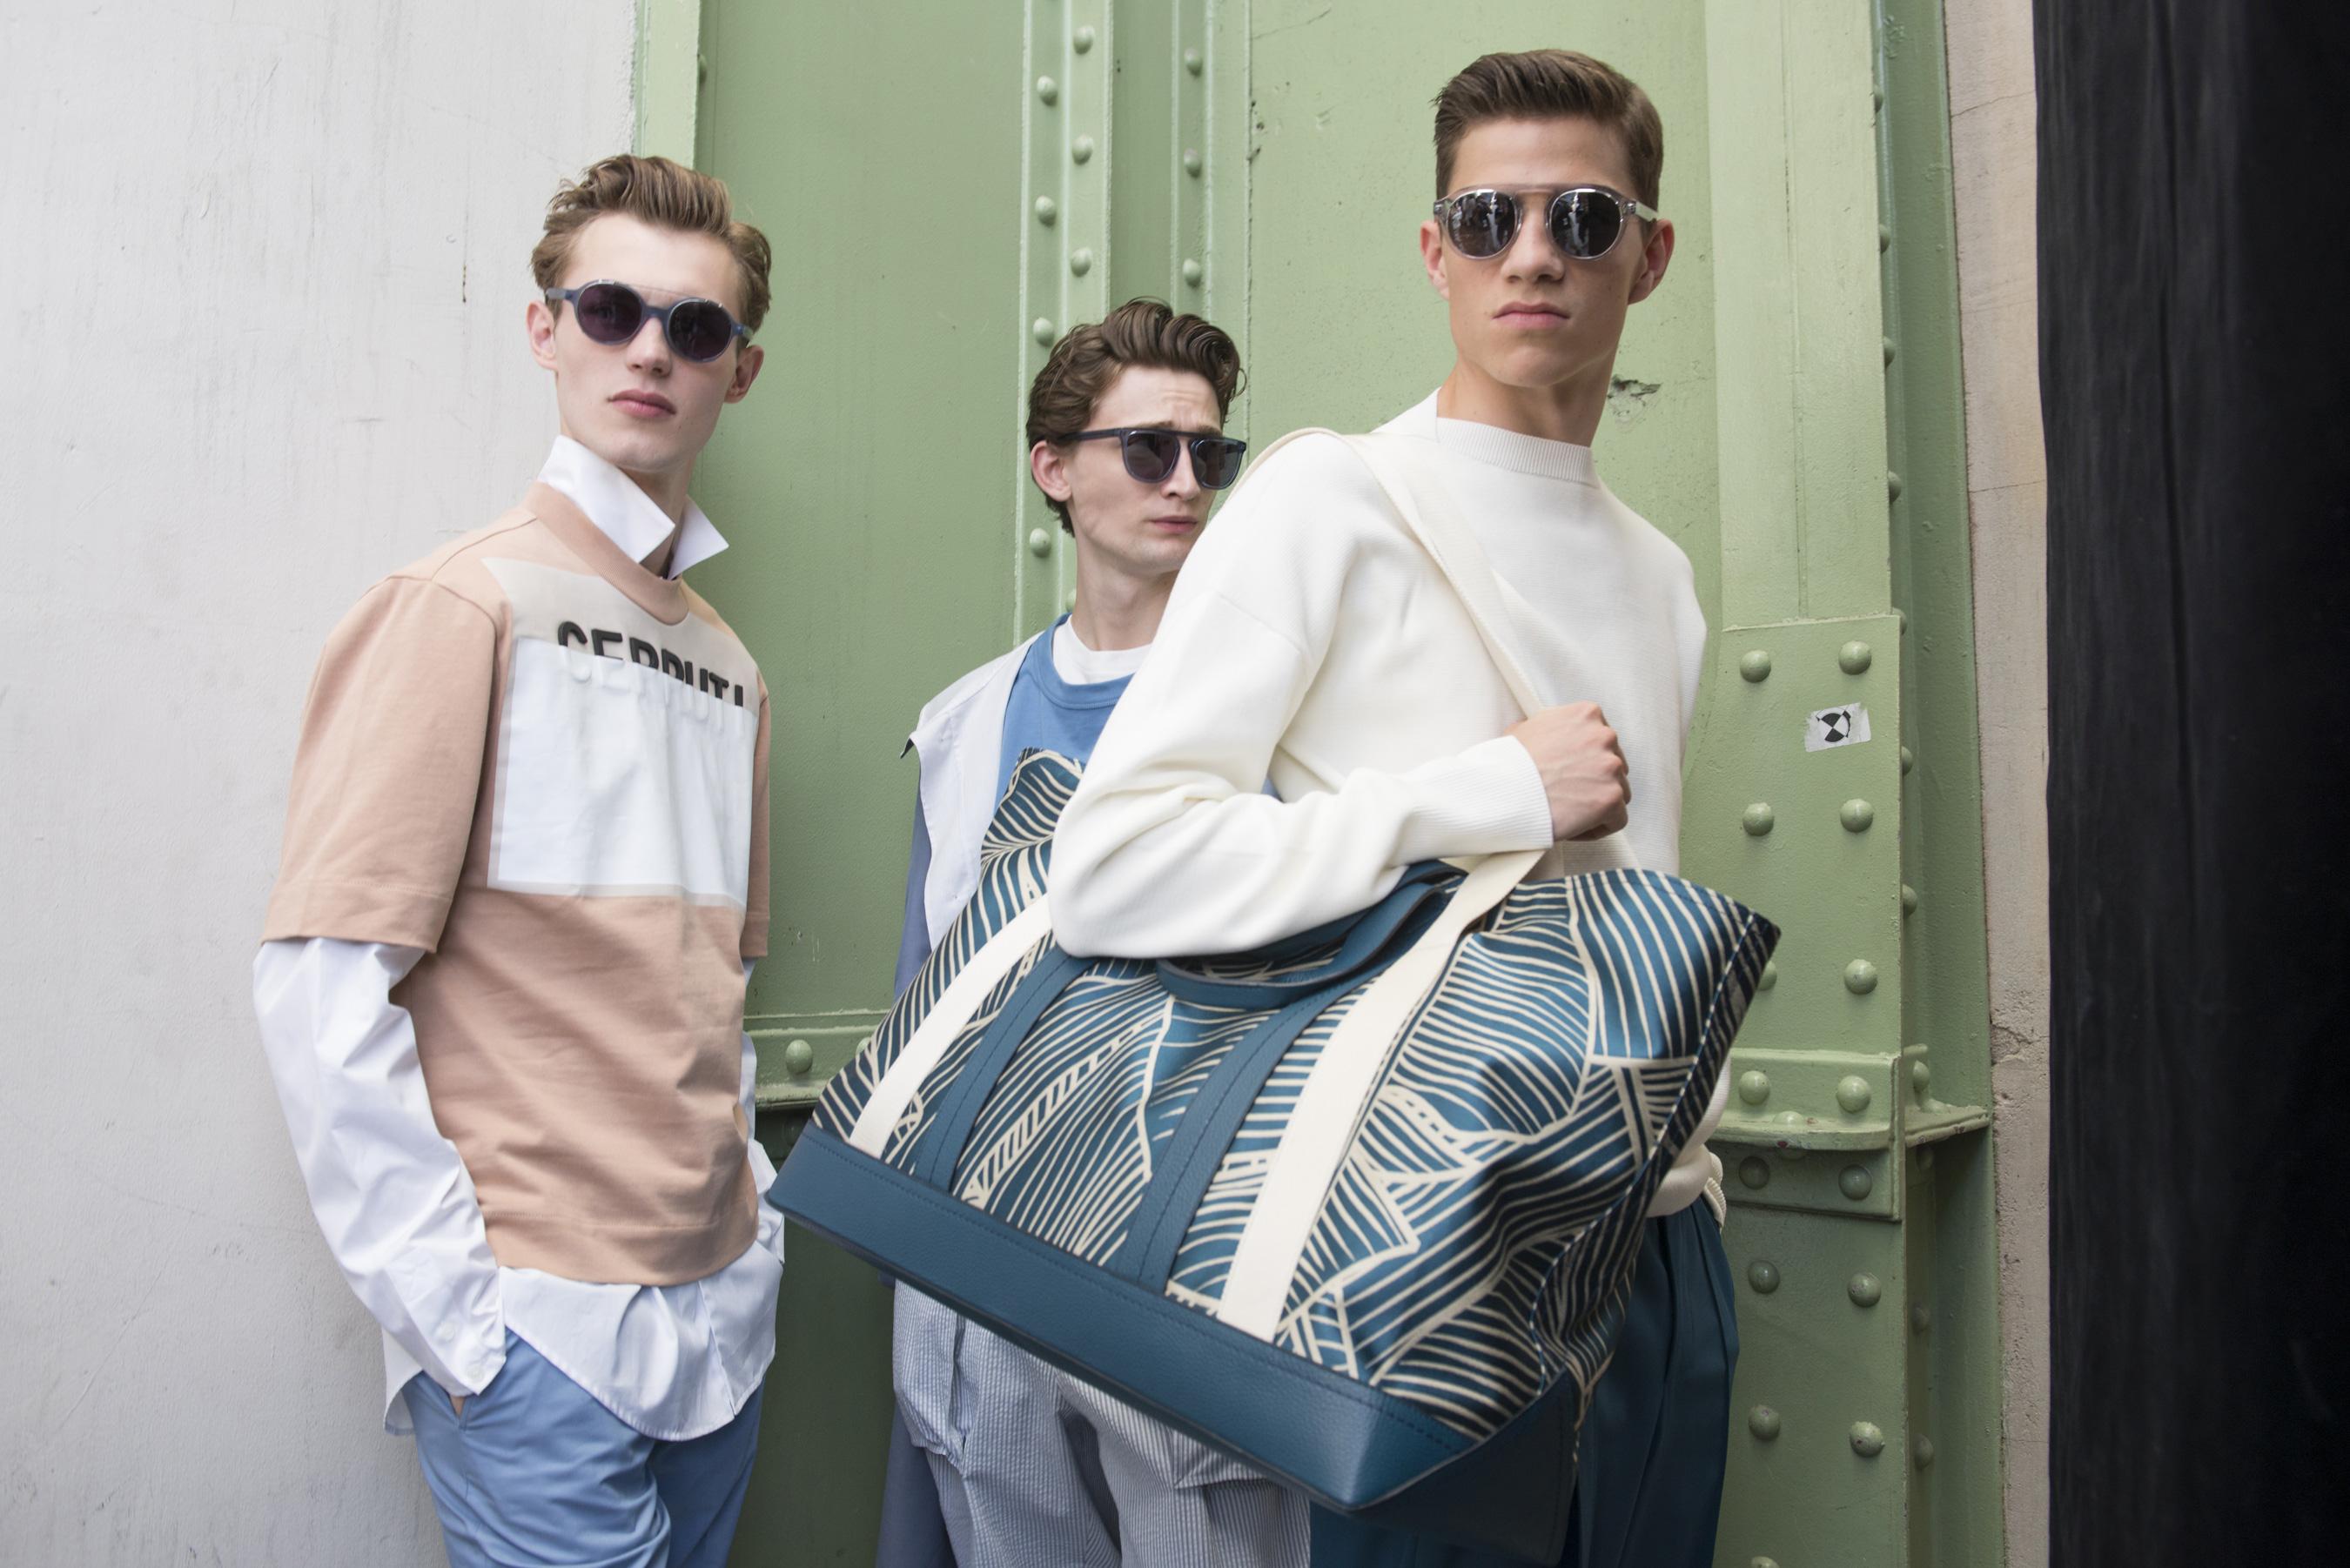 Cerruti Spring 2018 Men's Fashion Show Backstage